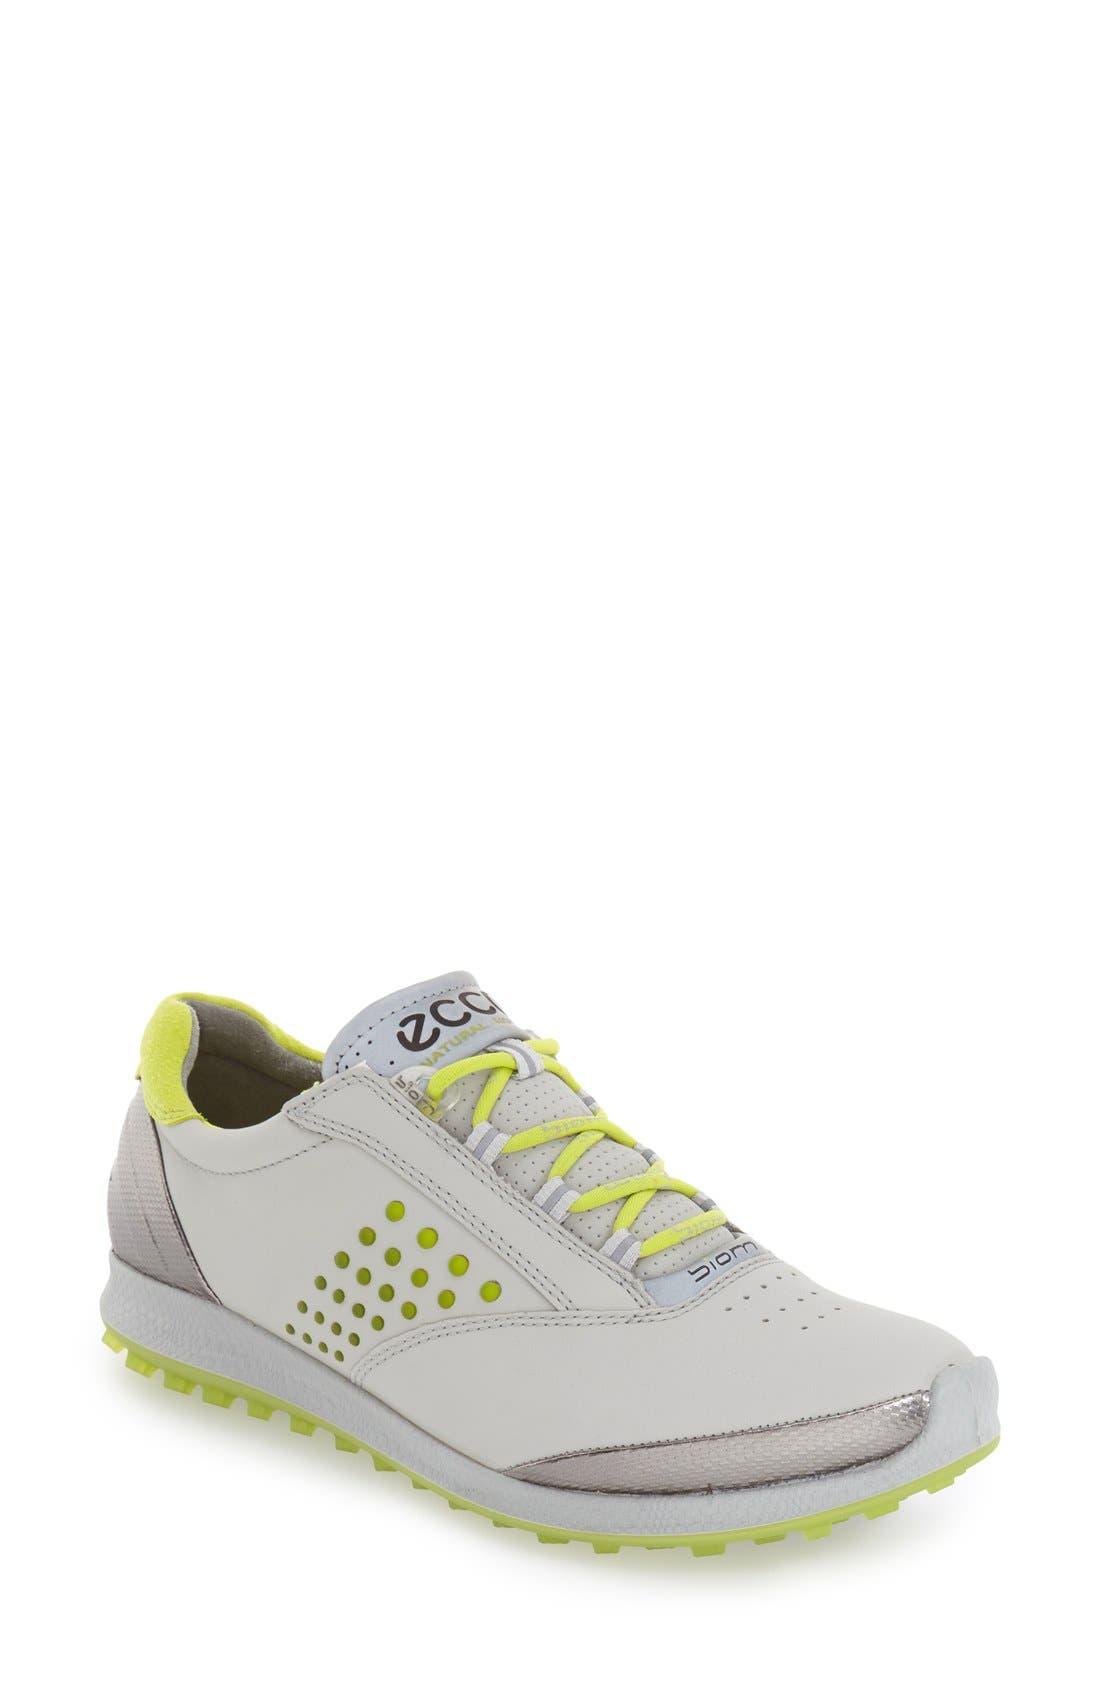 ECCO 'BIOM' Hydromax® Waterproof Golf Shoe (Women)